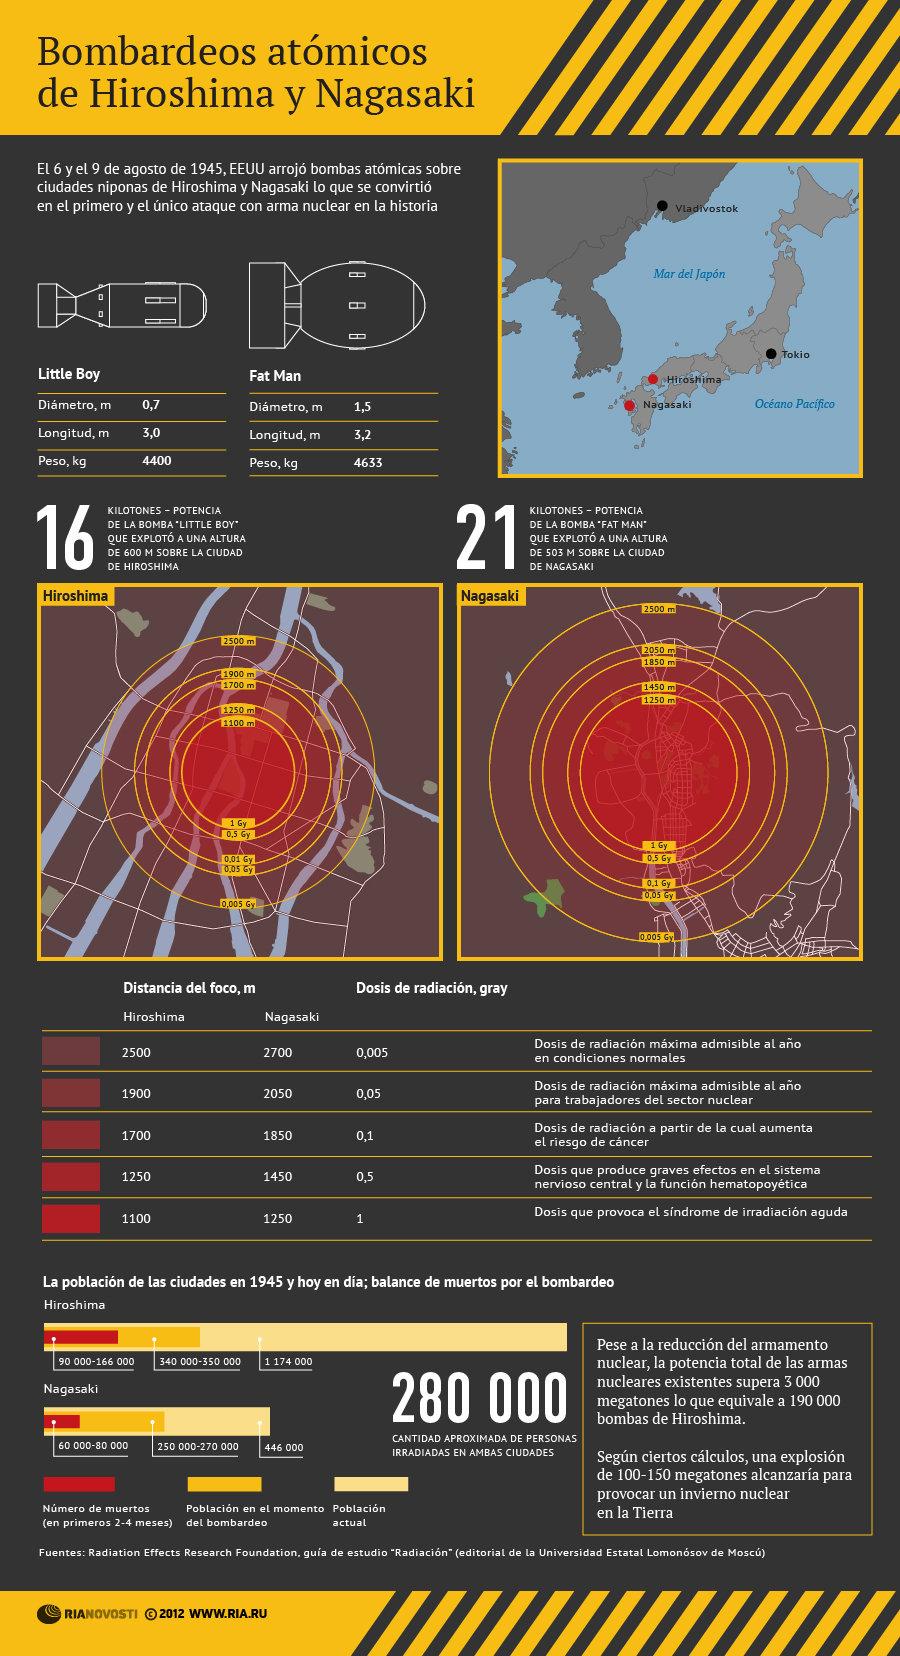 Bombardeos atómicos de Hiroshima y Nagasaki - Sputnik Mundo